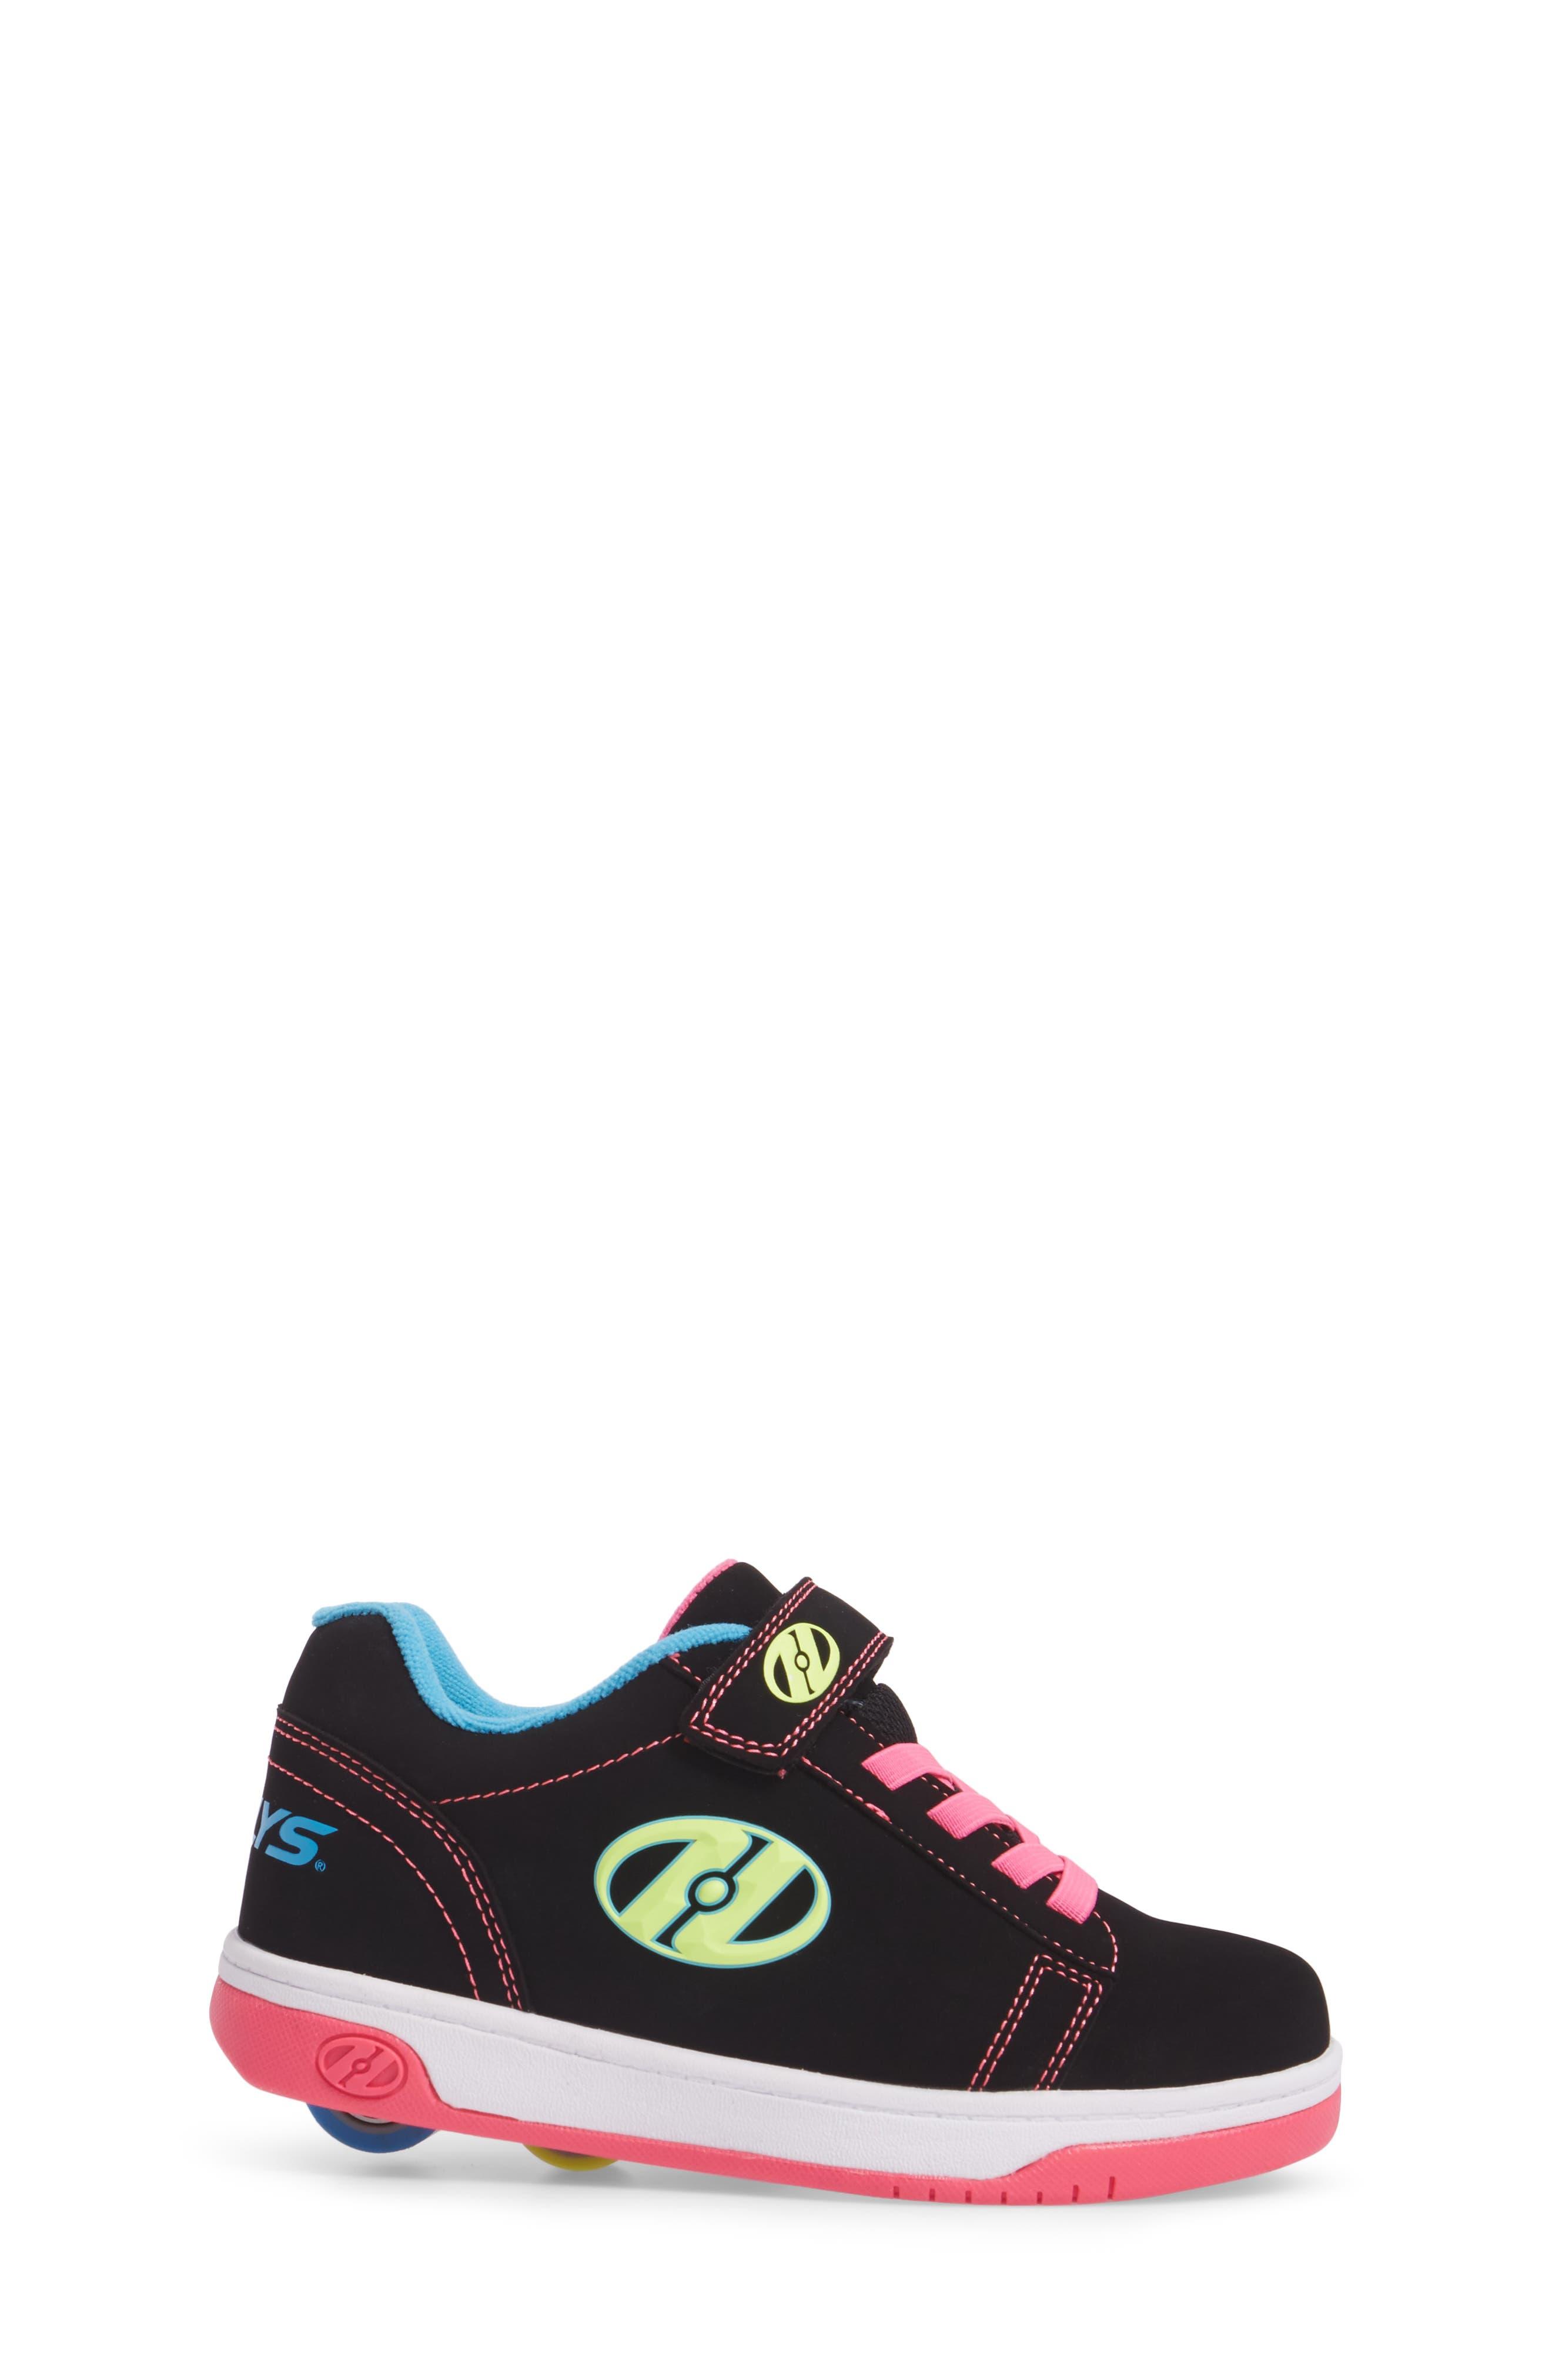 Dual Up Wheeled Skate Sneaker,                             Alternate thumbnail 3, color,                             Black/ Neon Multi